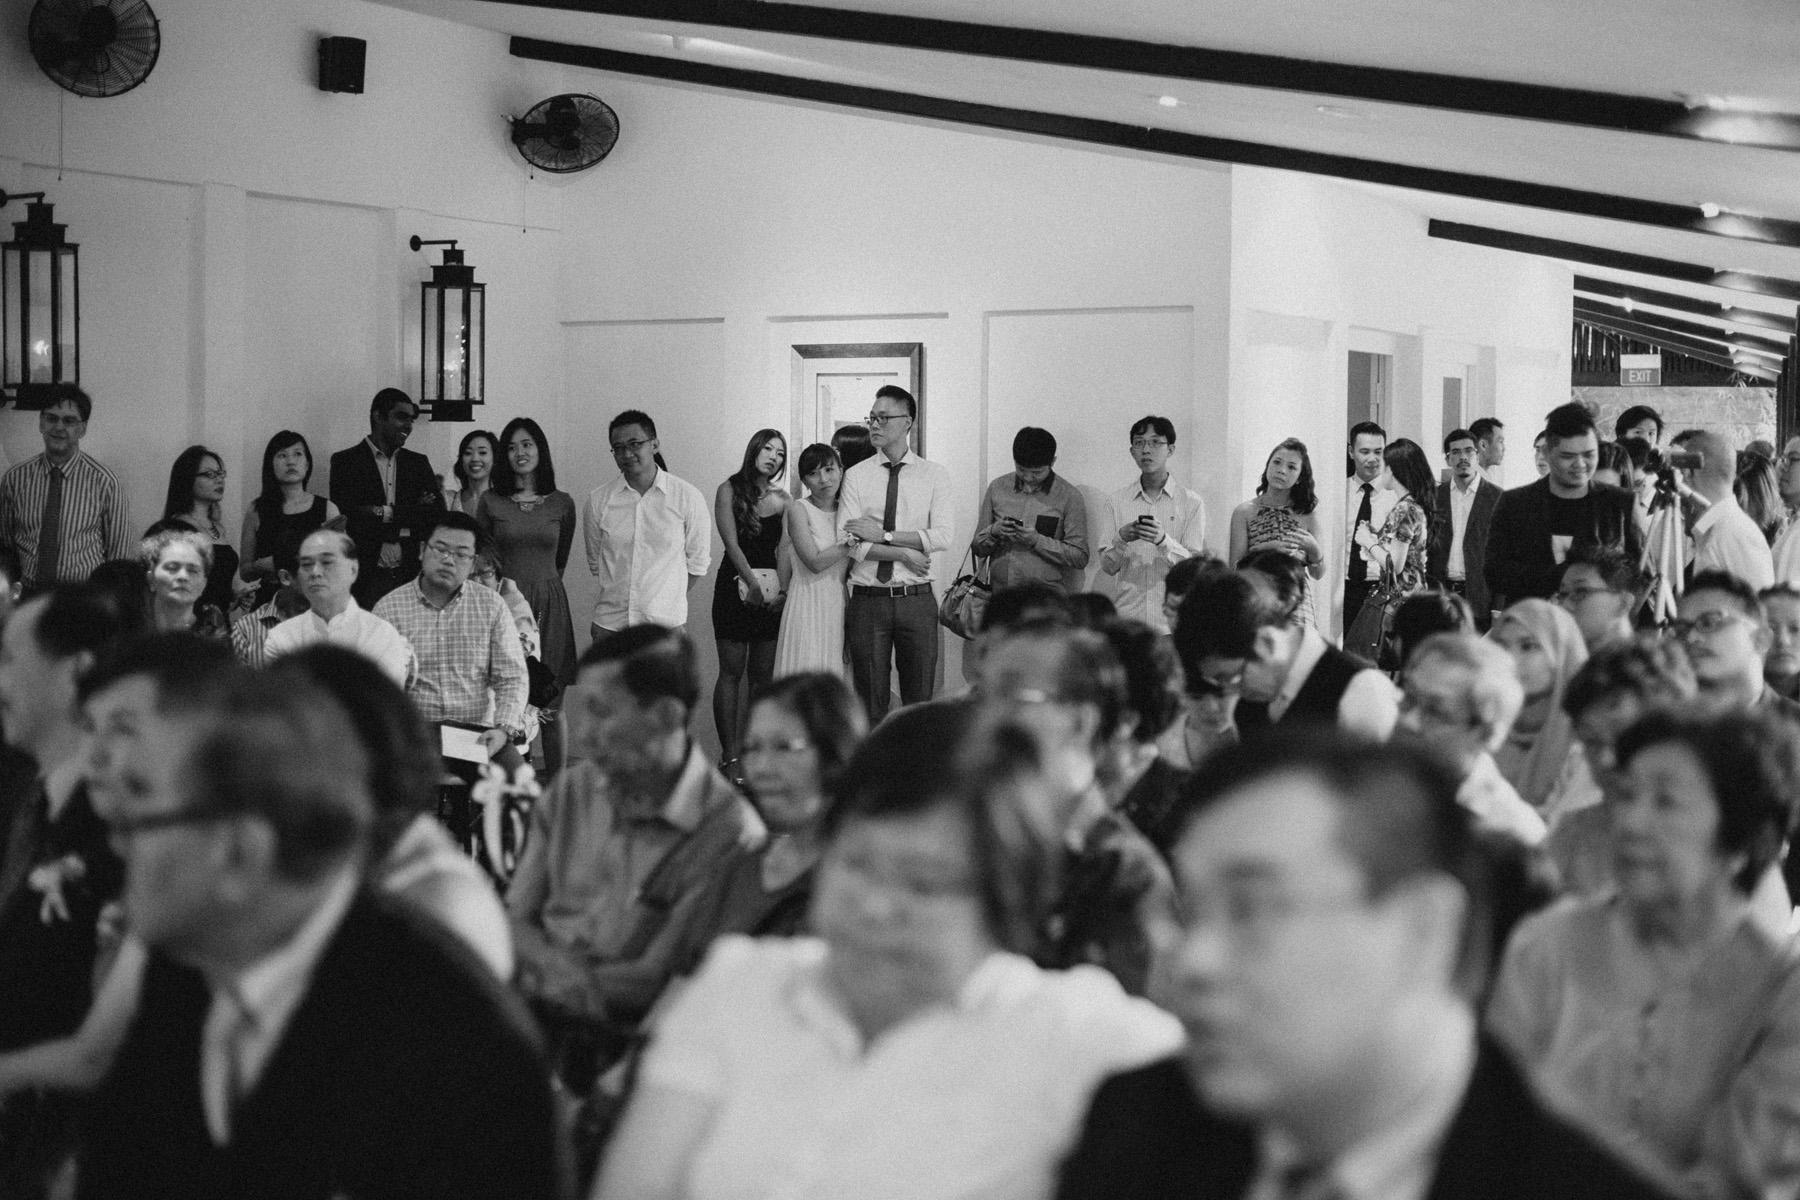 singapore-wedding-travel-photographer-faith-alvin-wedding-wmt-39.jpg